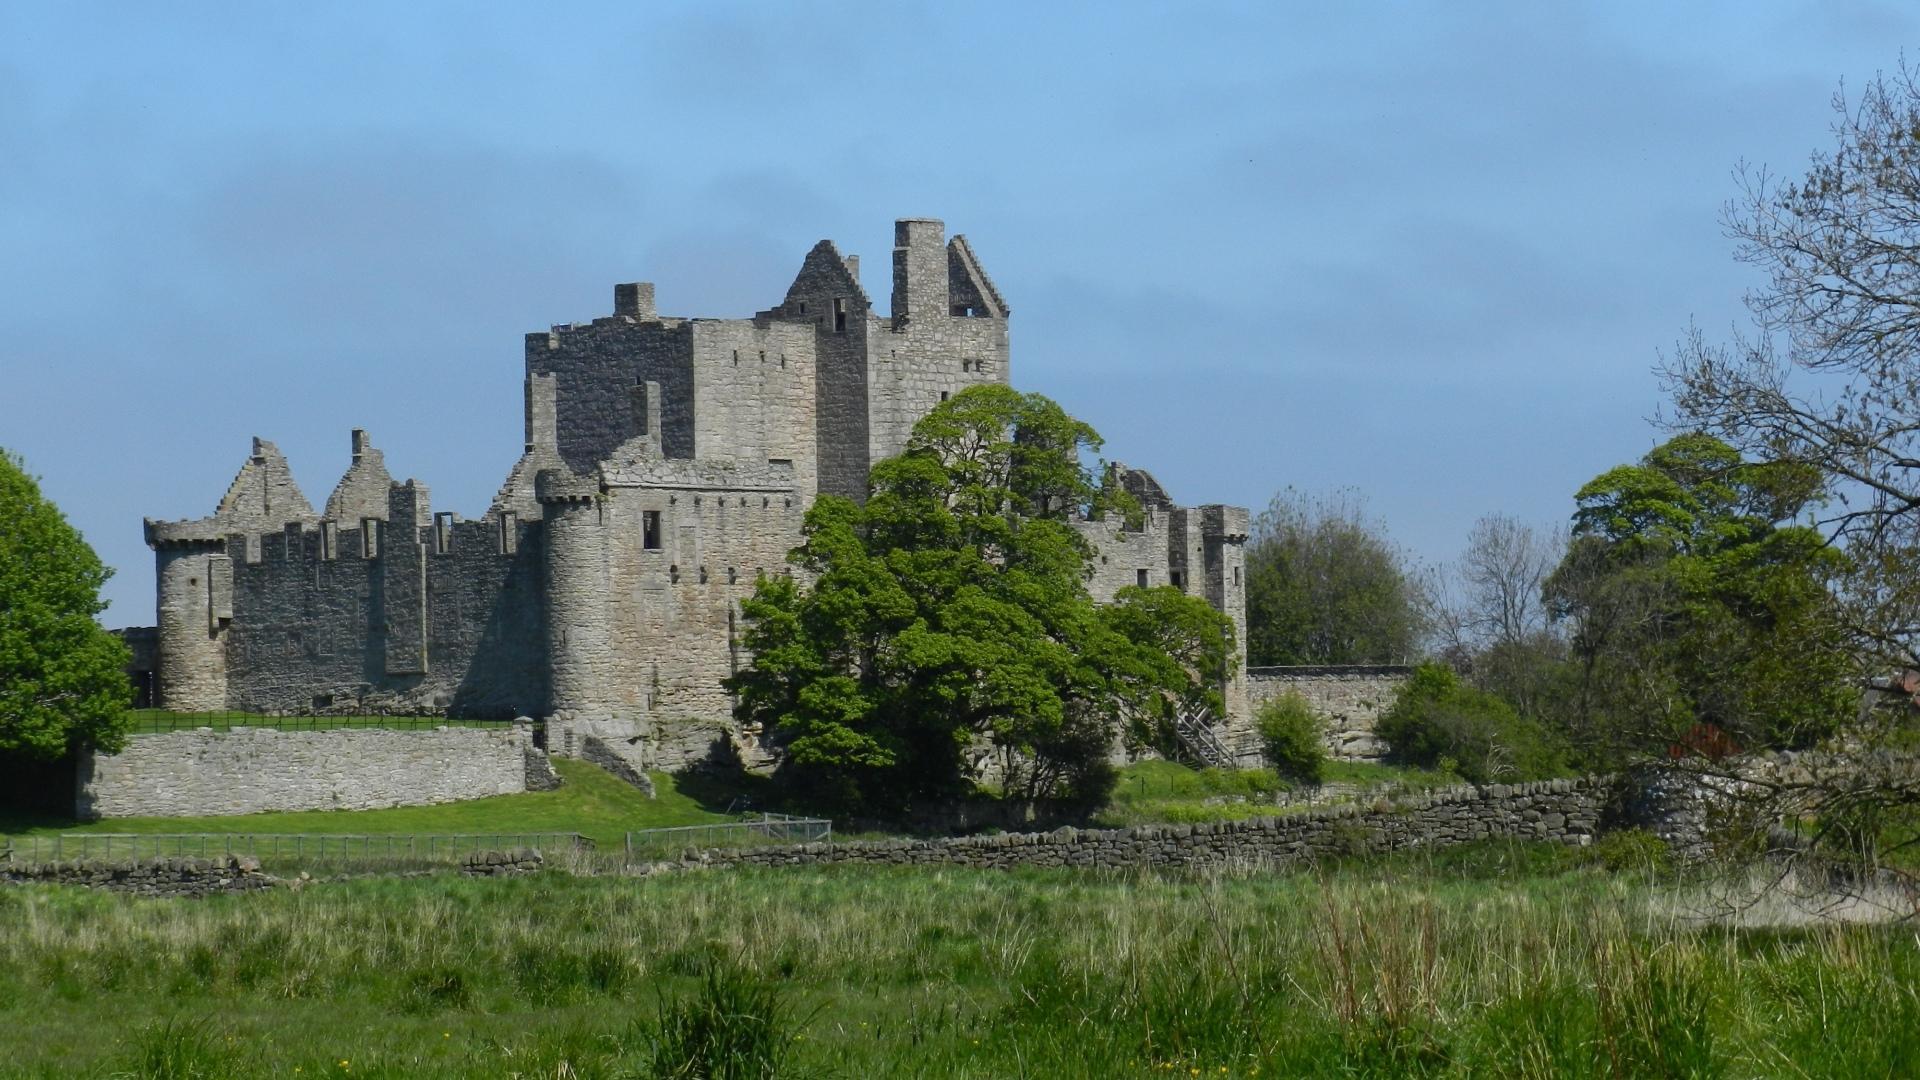 Craigmillar Castle wallpapers HD quality